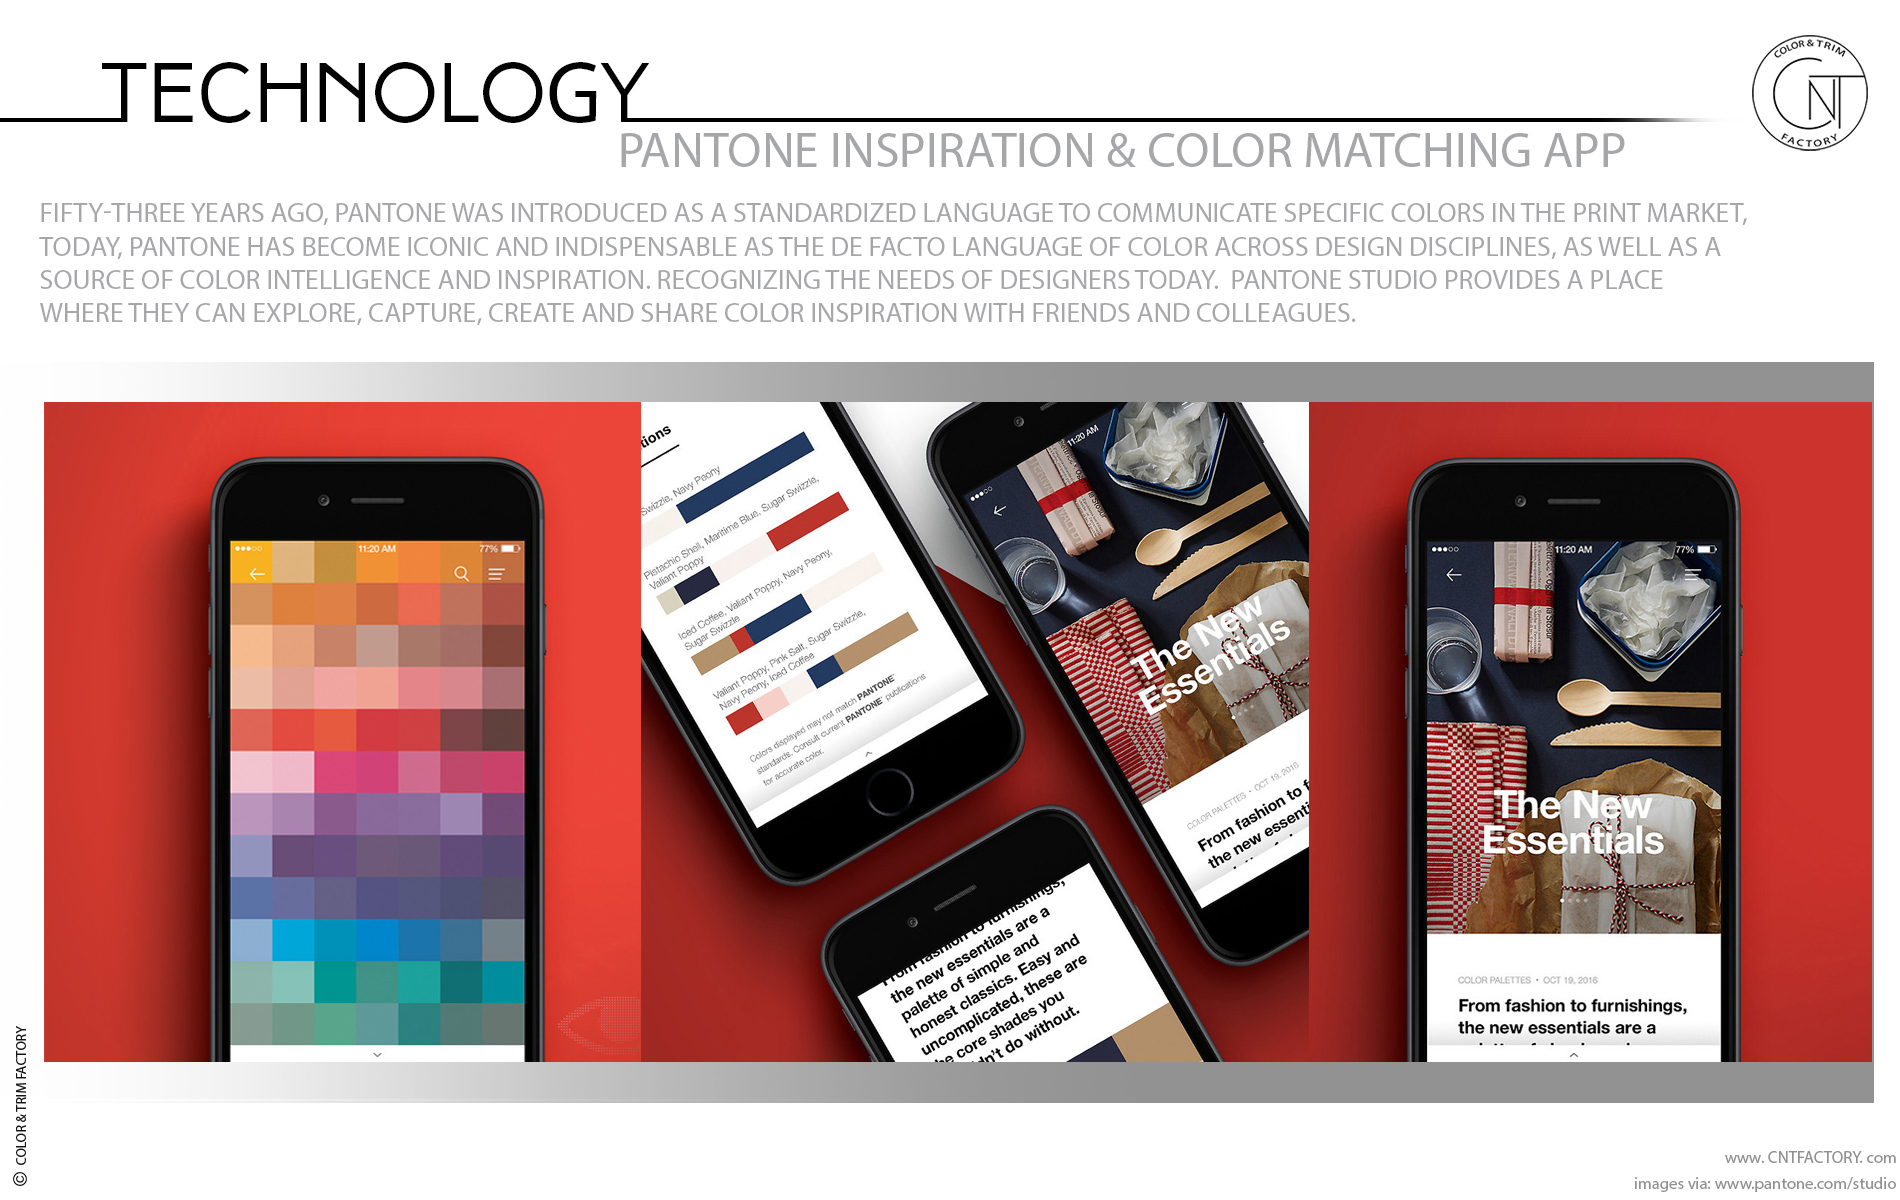 Transform inspiration PANTONE Inspiration Color Matching App